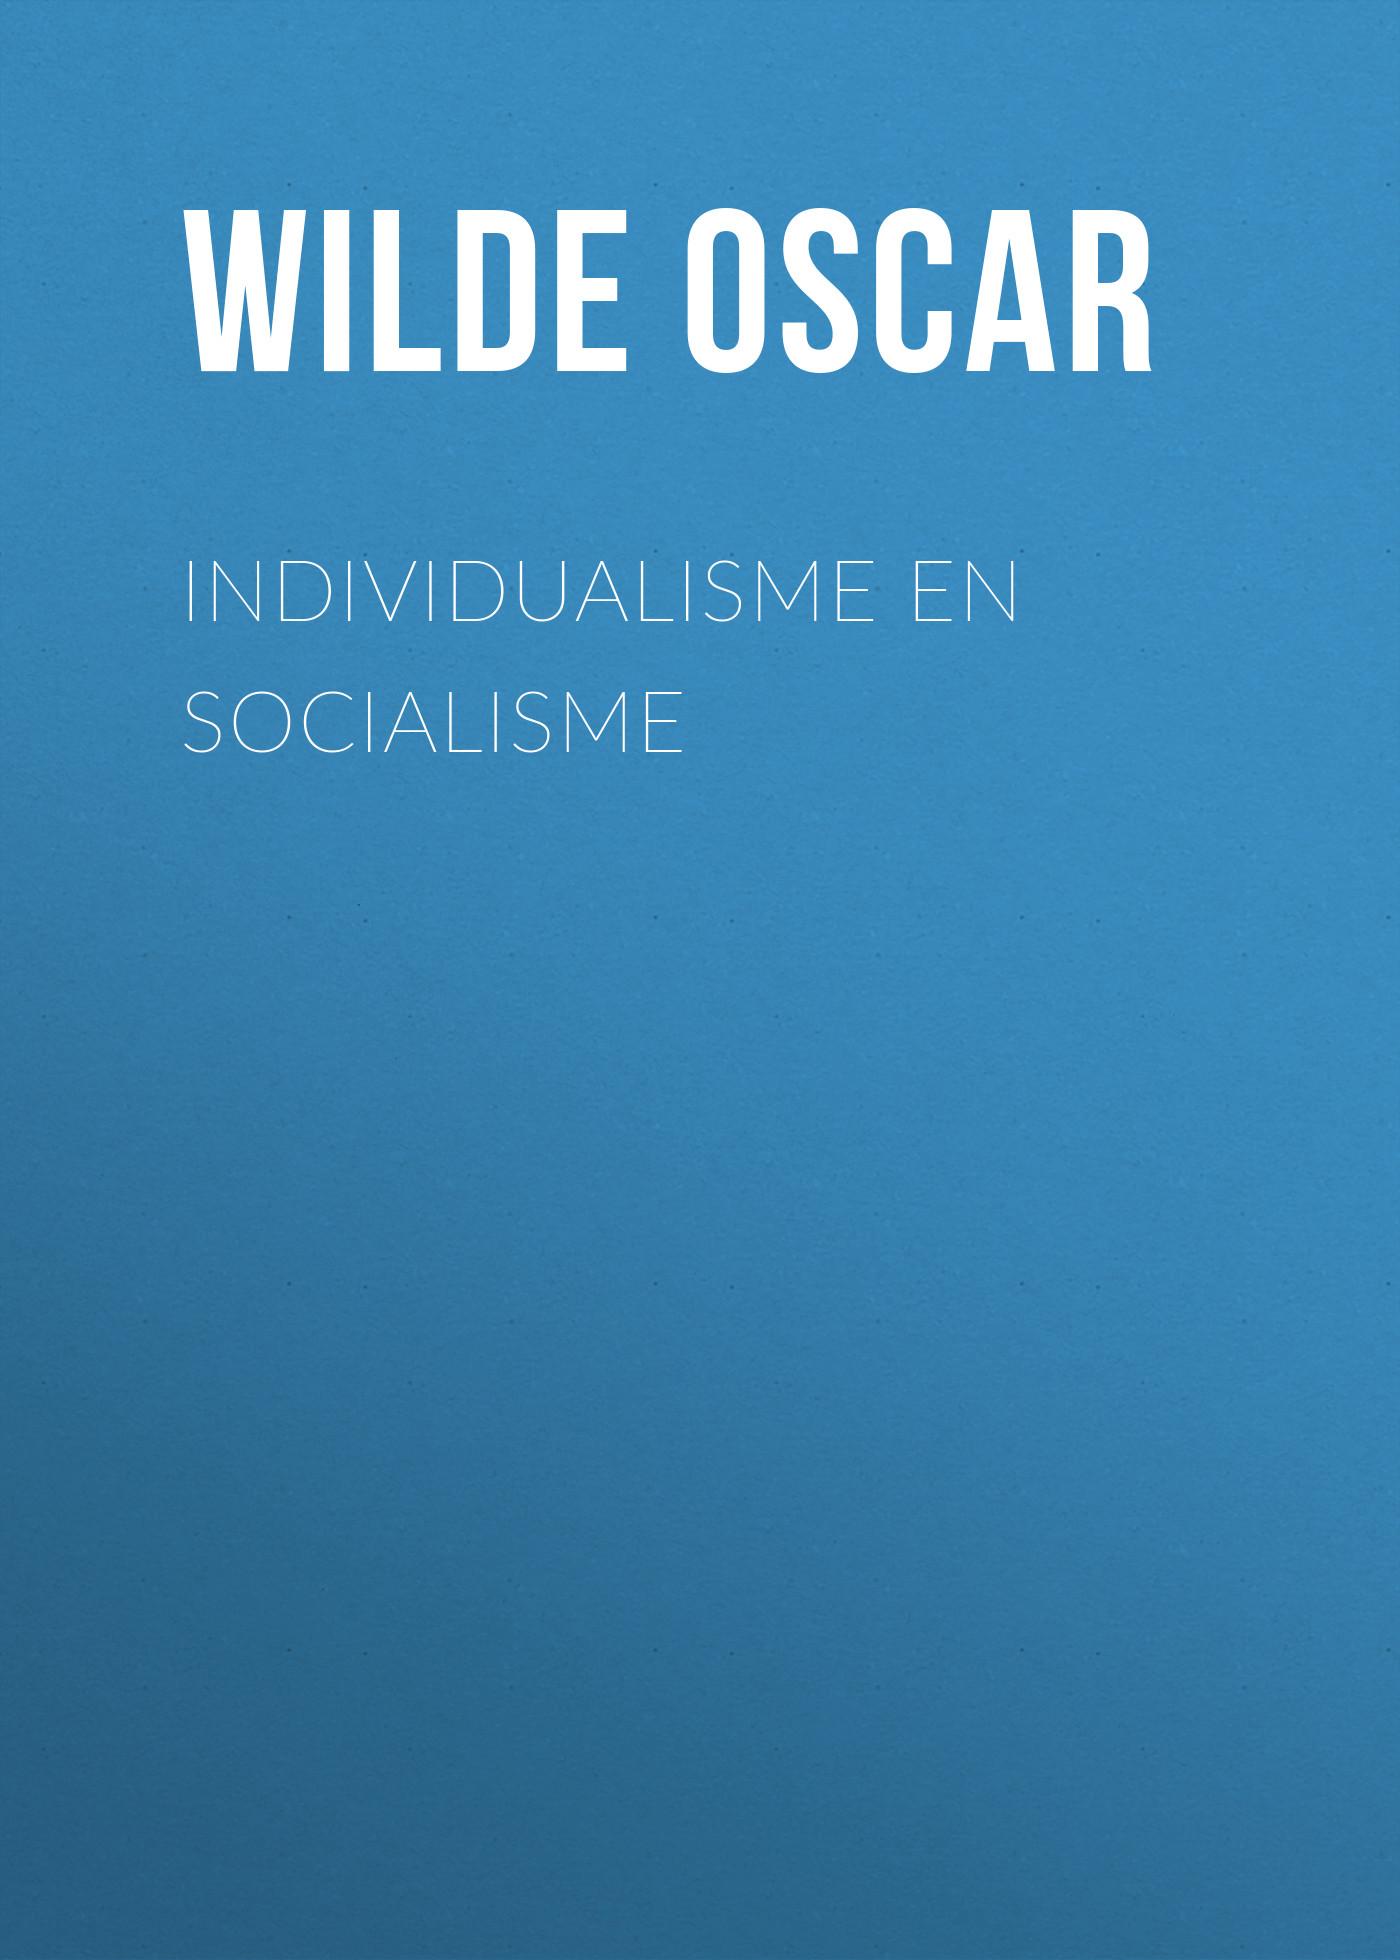 Individualisme en socialisme